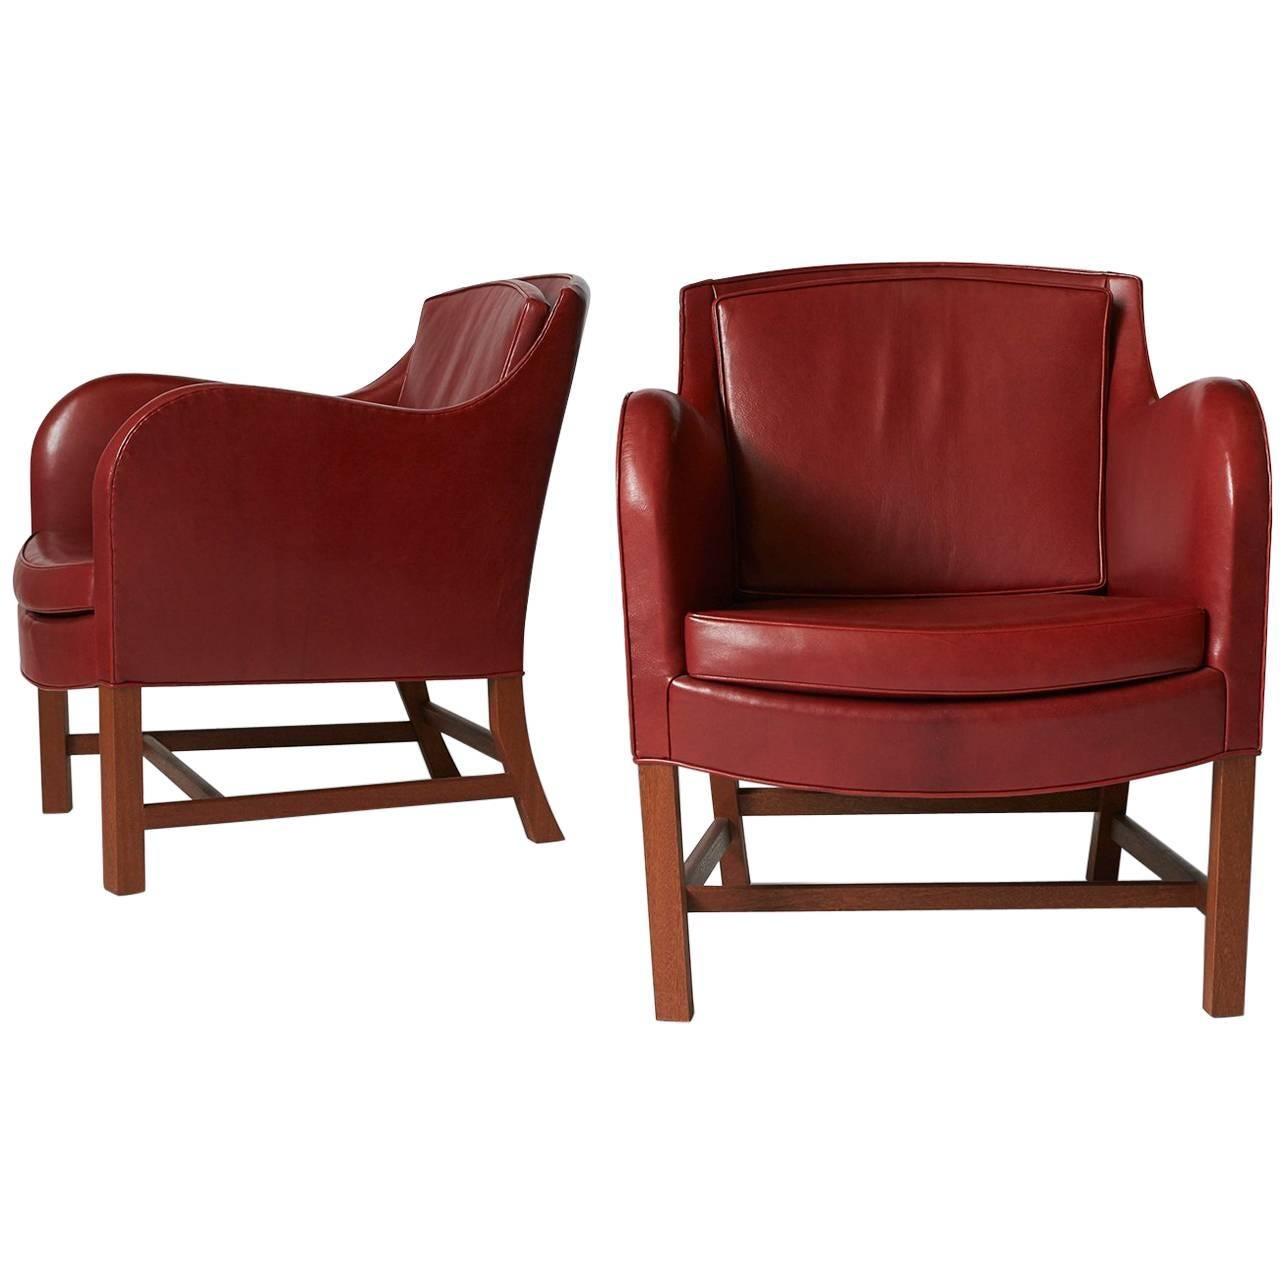 "Pair of Kaare Klint ""Mix' Chairs"